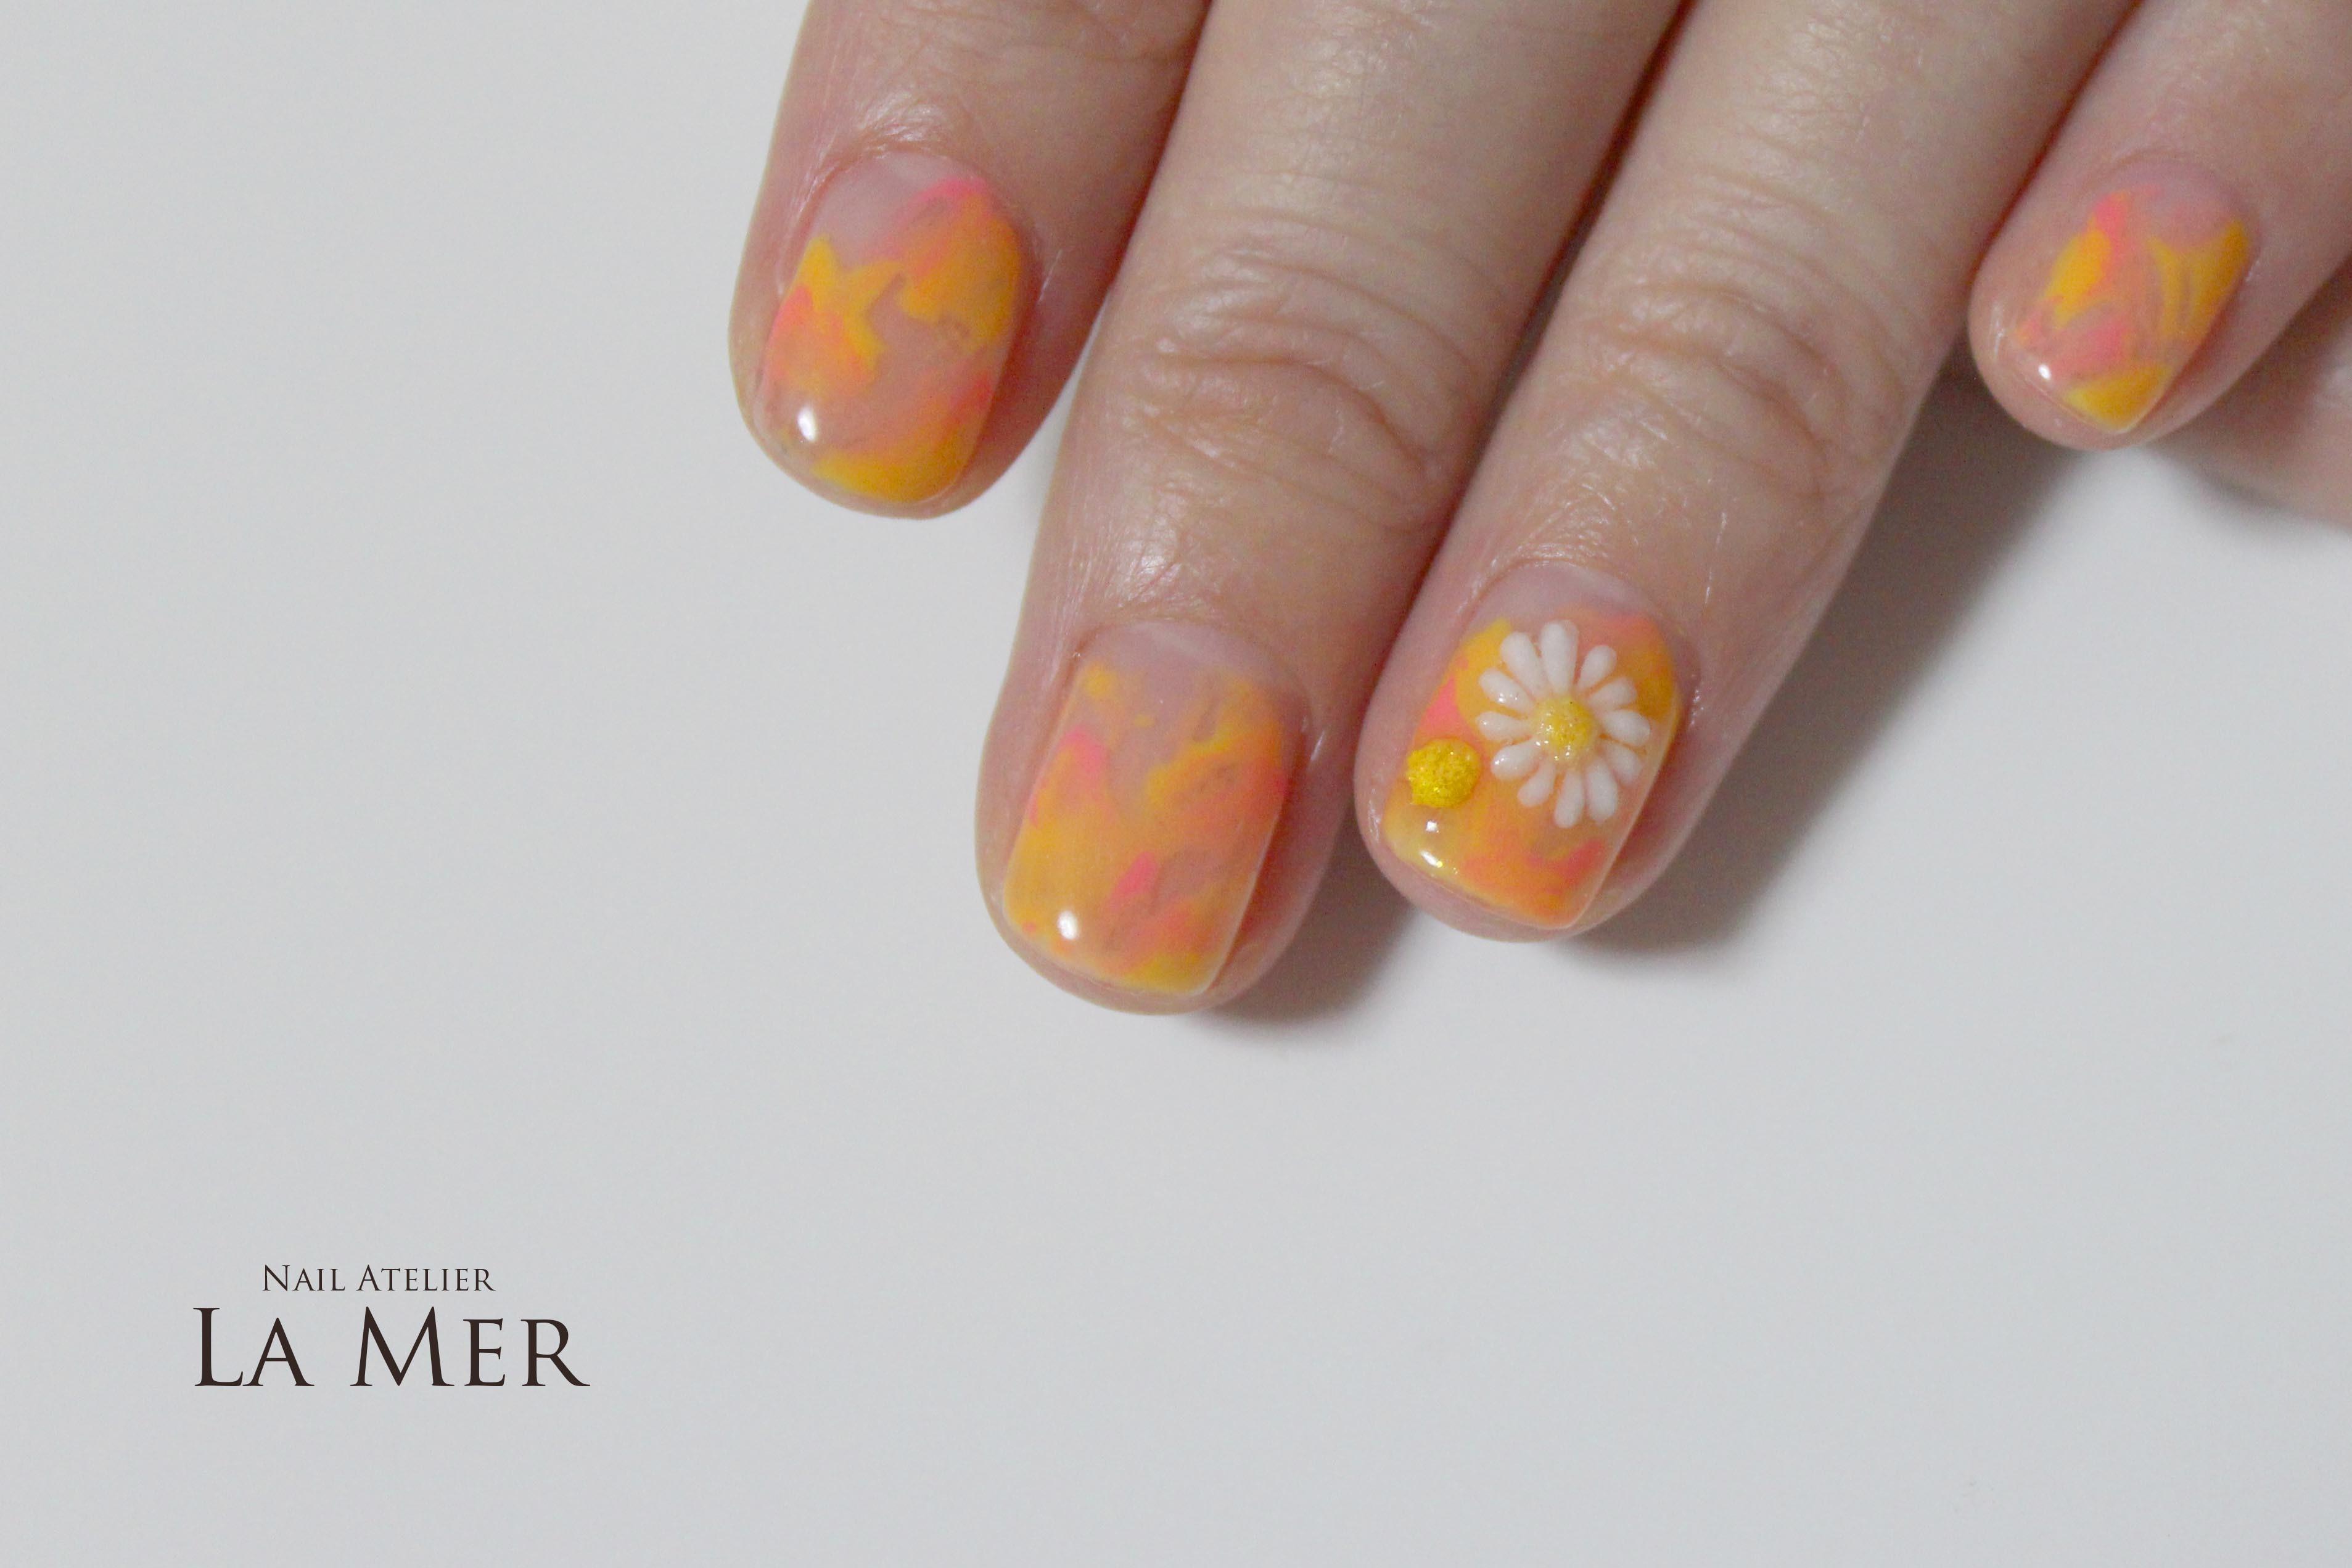 NailArtist NORIKO chrysanthemum 3D_2